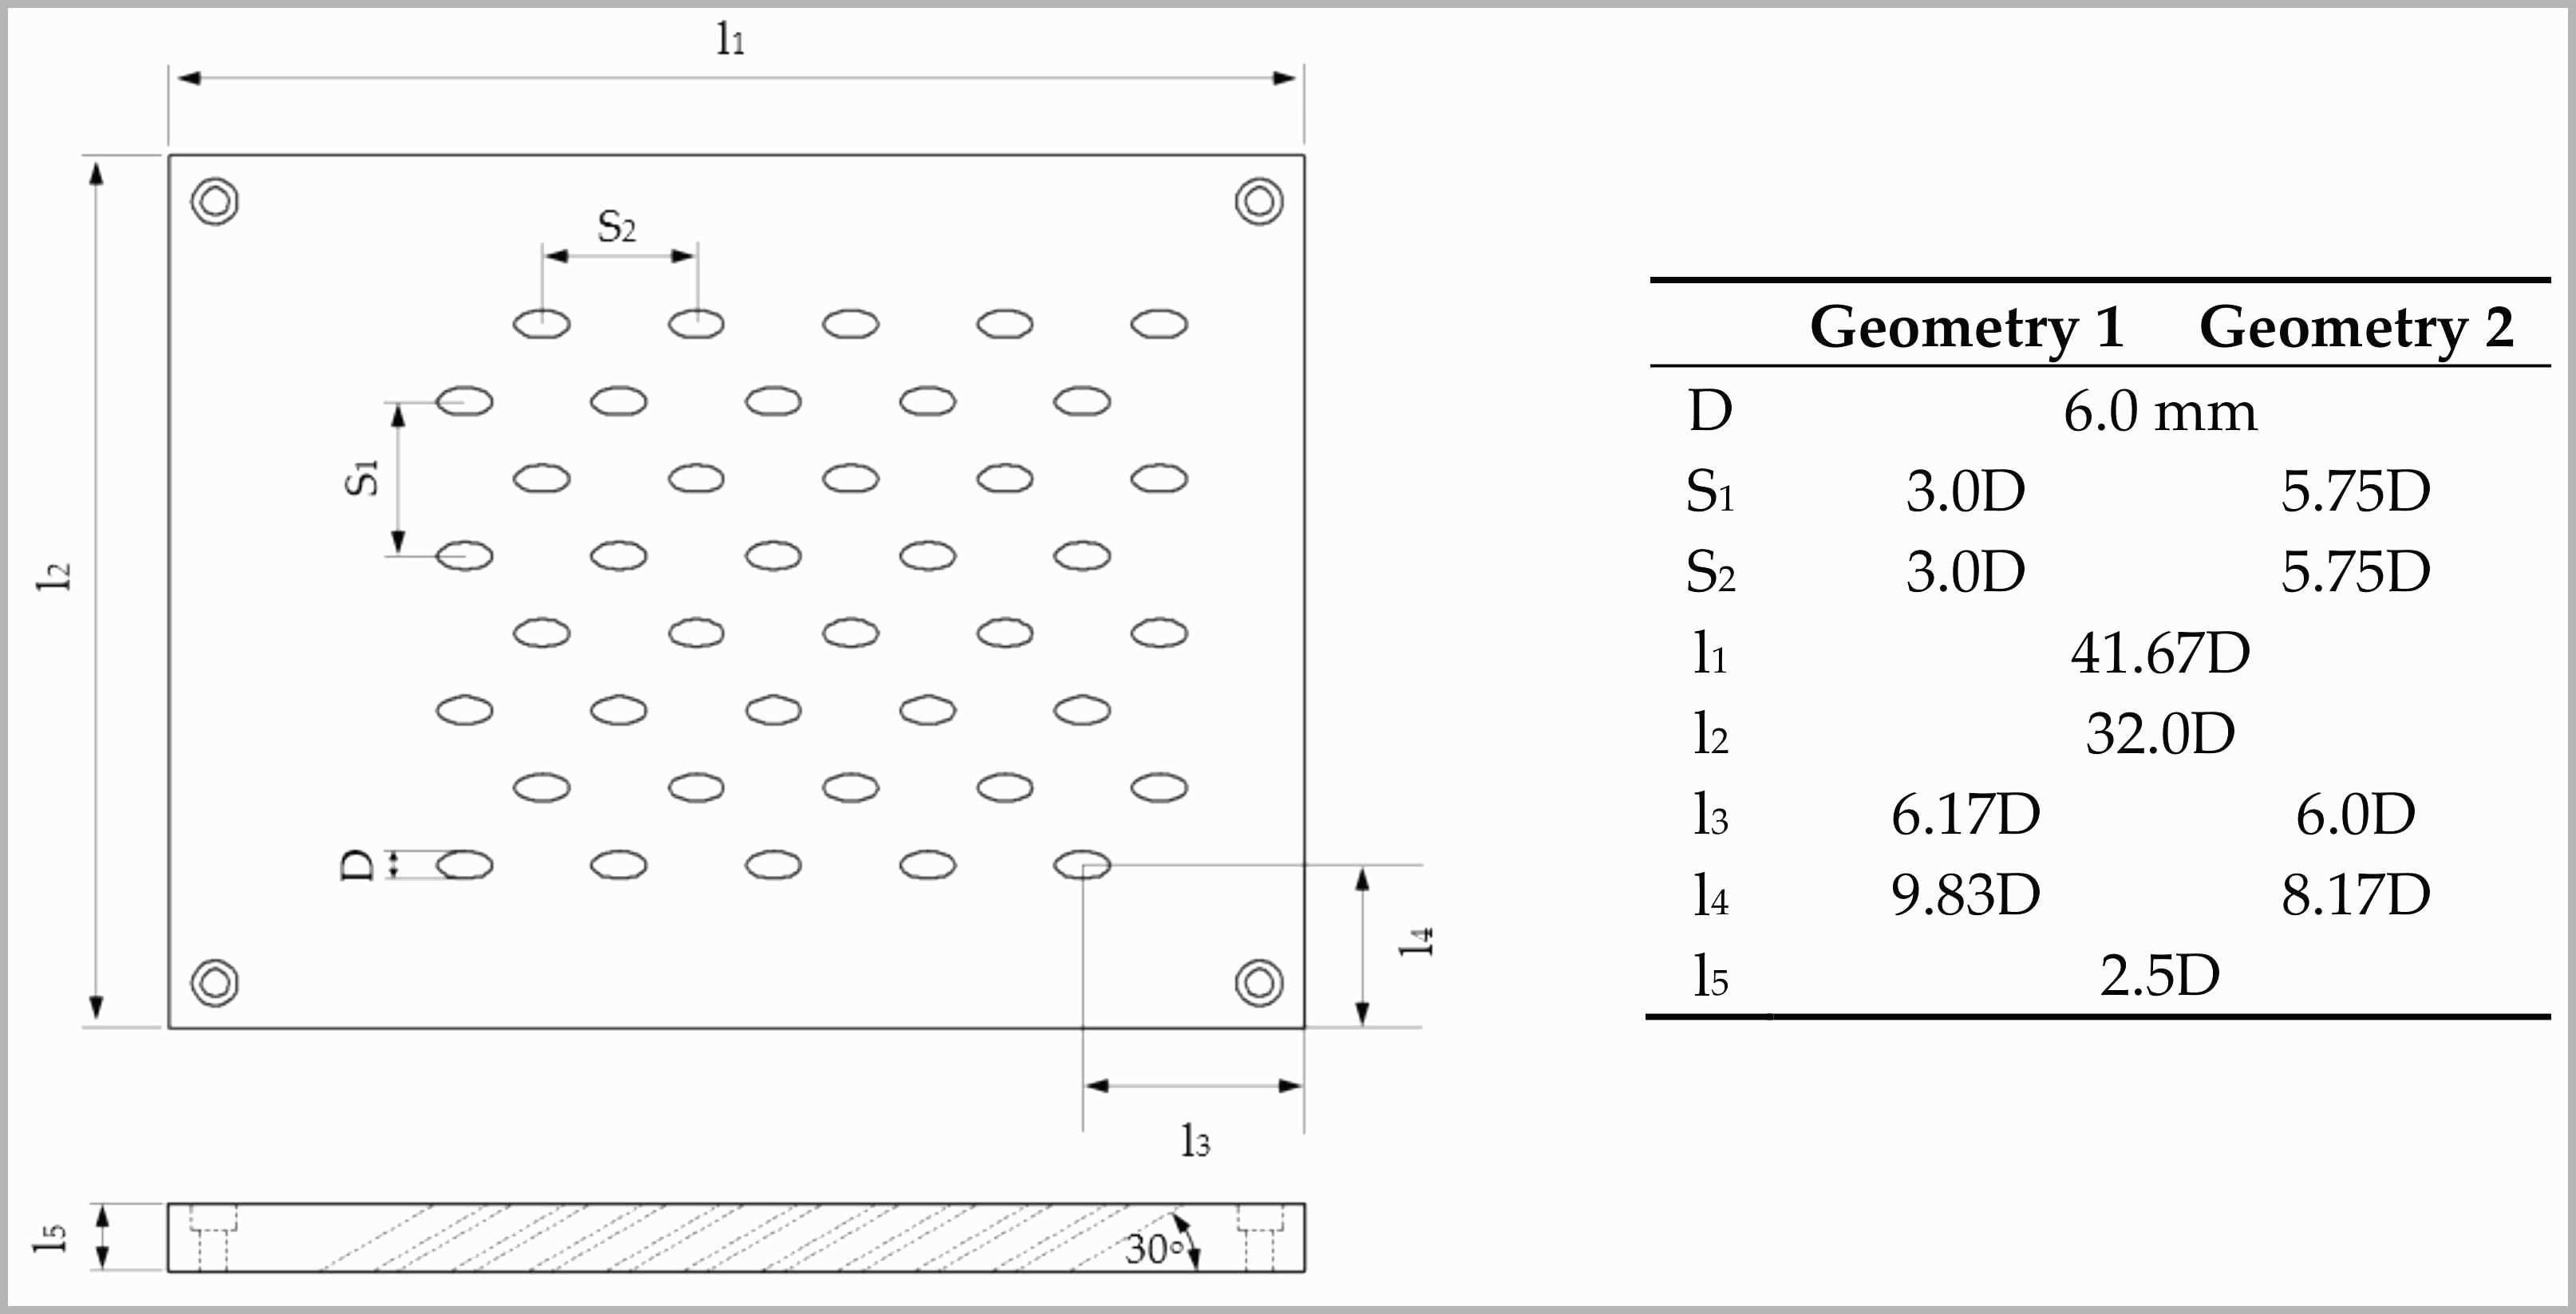 Greek Alphabet Printable Worksheets - Photos Alphabet Collections | Greek Alphabet Printable Worksheets